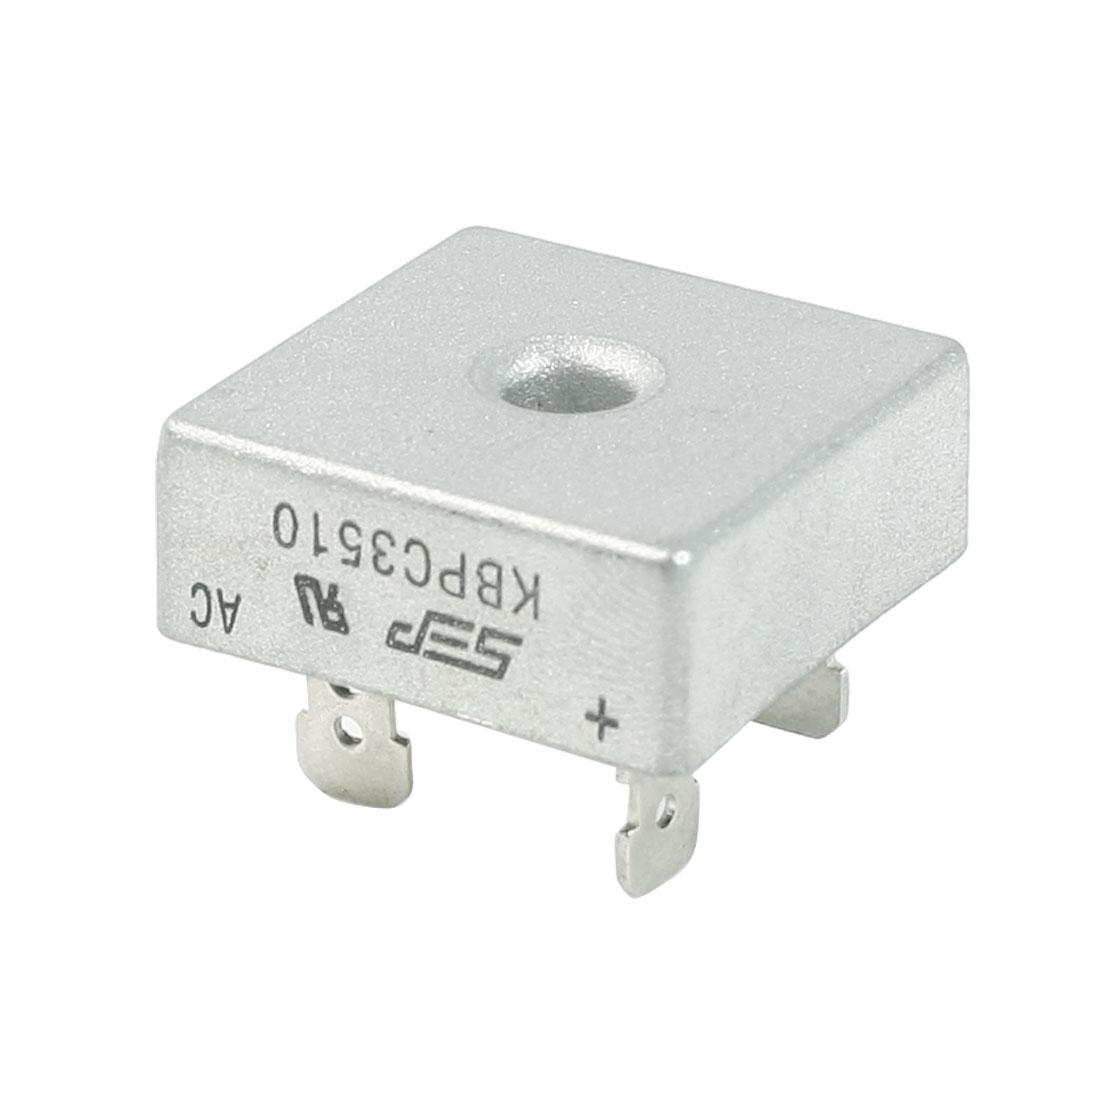 KBPC35-10 1KV 35Amp Silver Tone Metal Case Single Phase Bridge Rectifier